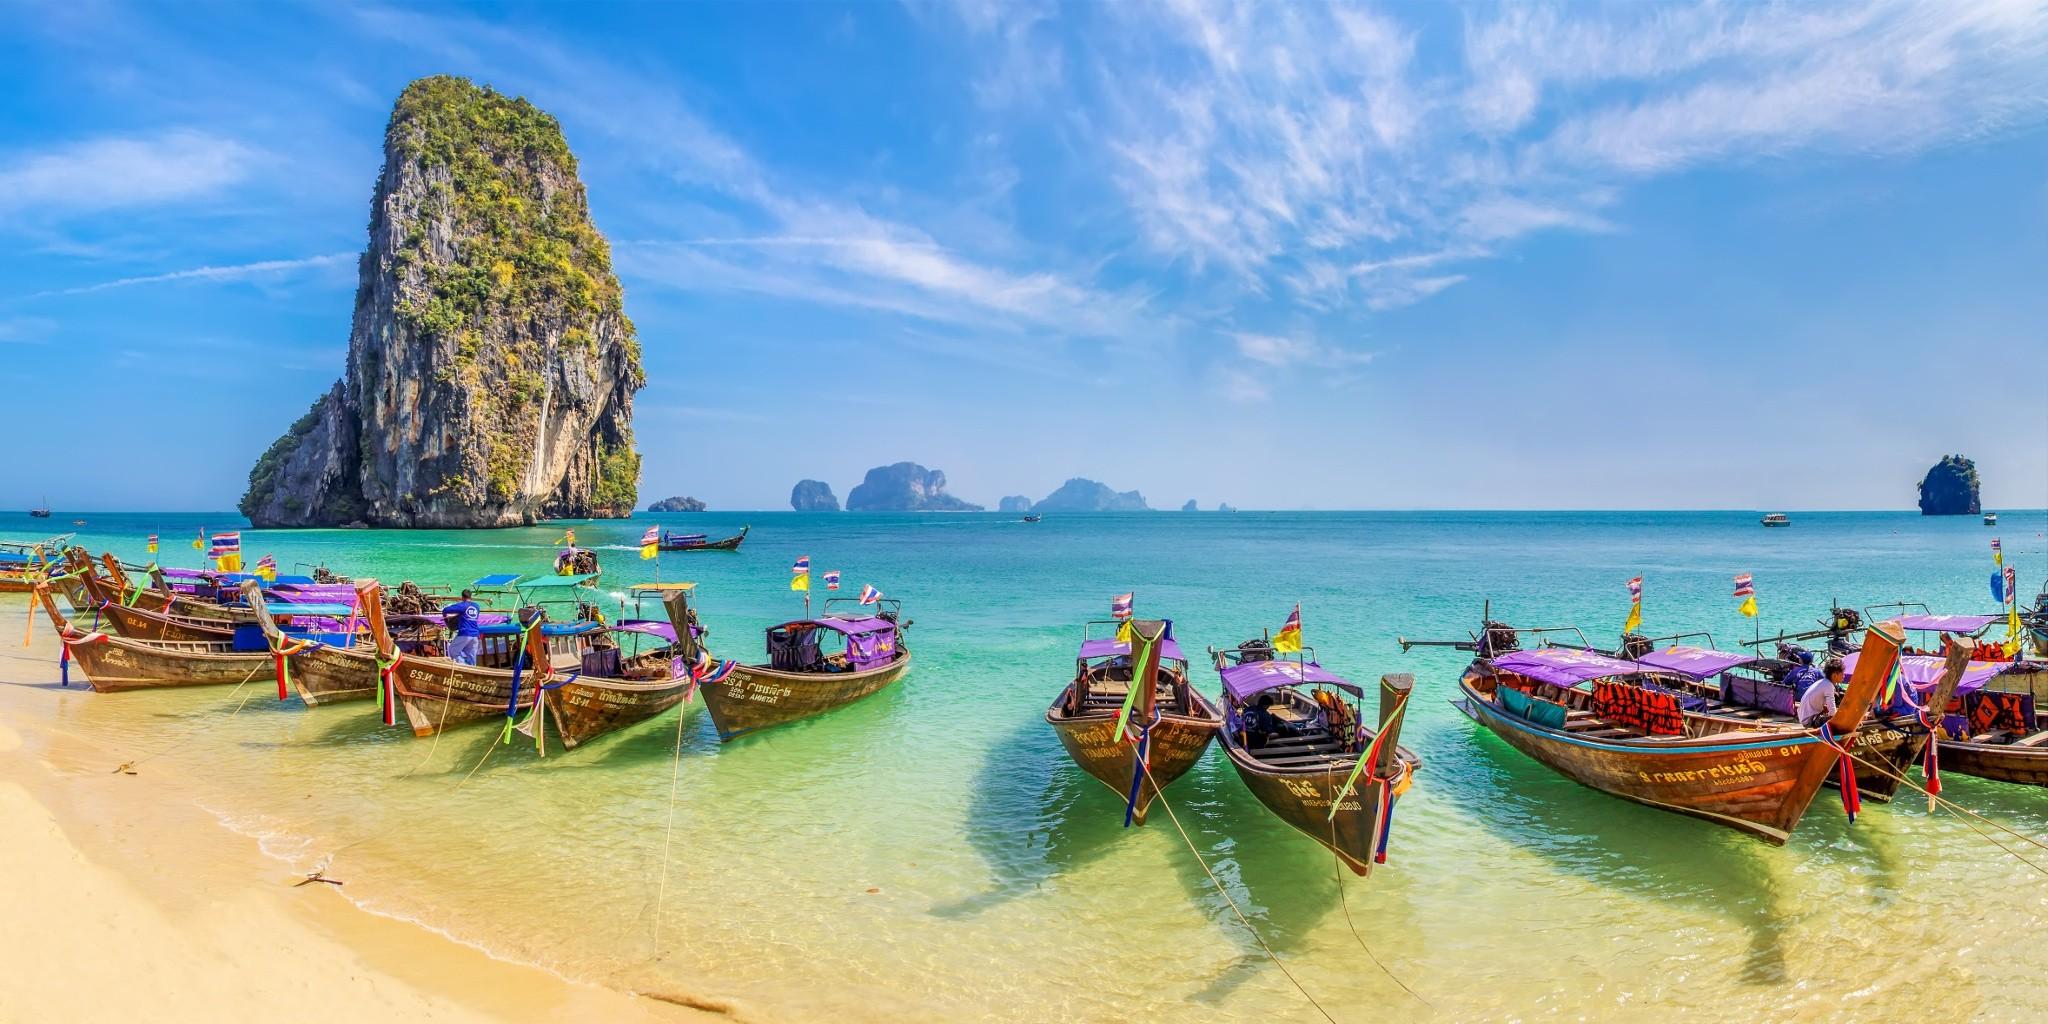 Wallpaper : Landscape, Sea, Bay, Nature, Sand, Sky, Beach